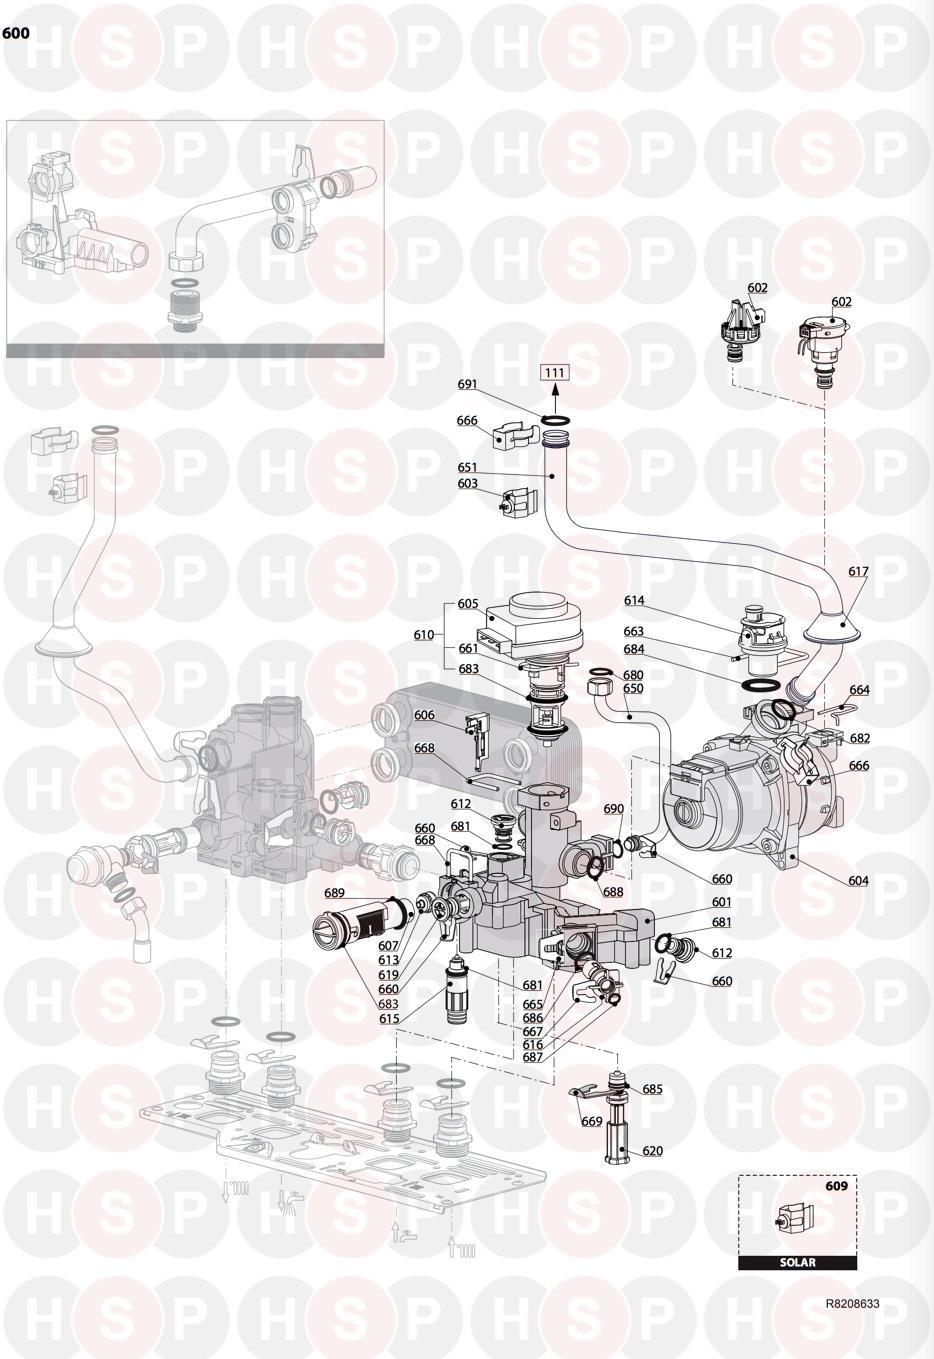 Ariston E SYSTEM EVO 30 ERP Appliance Diagram (RETURN